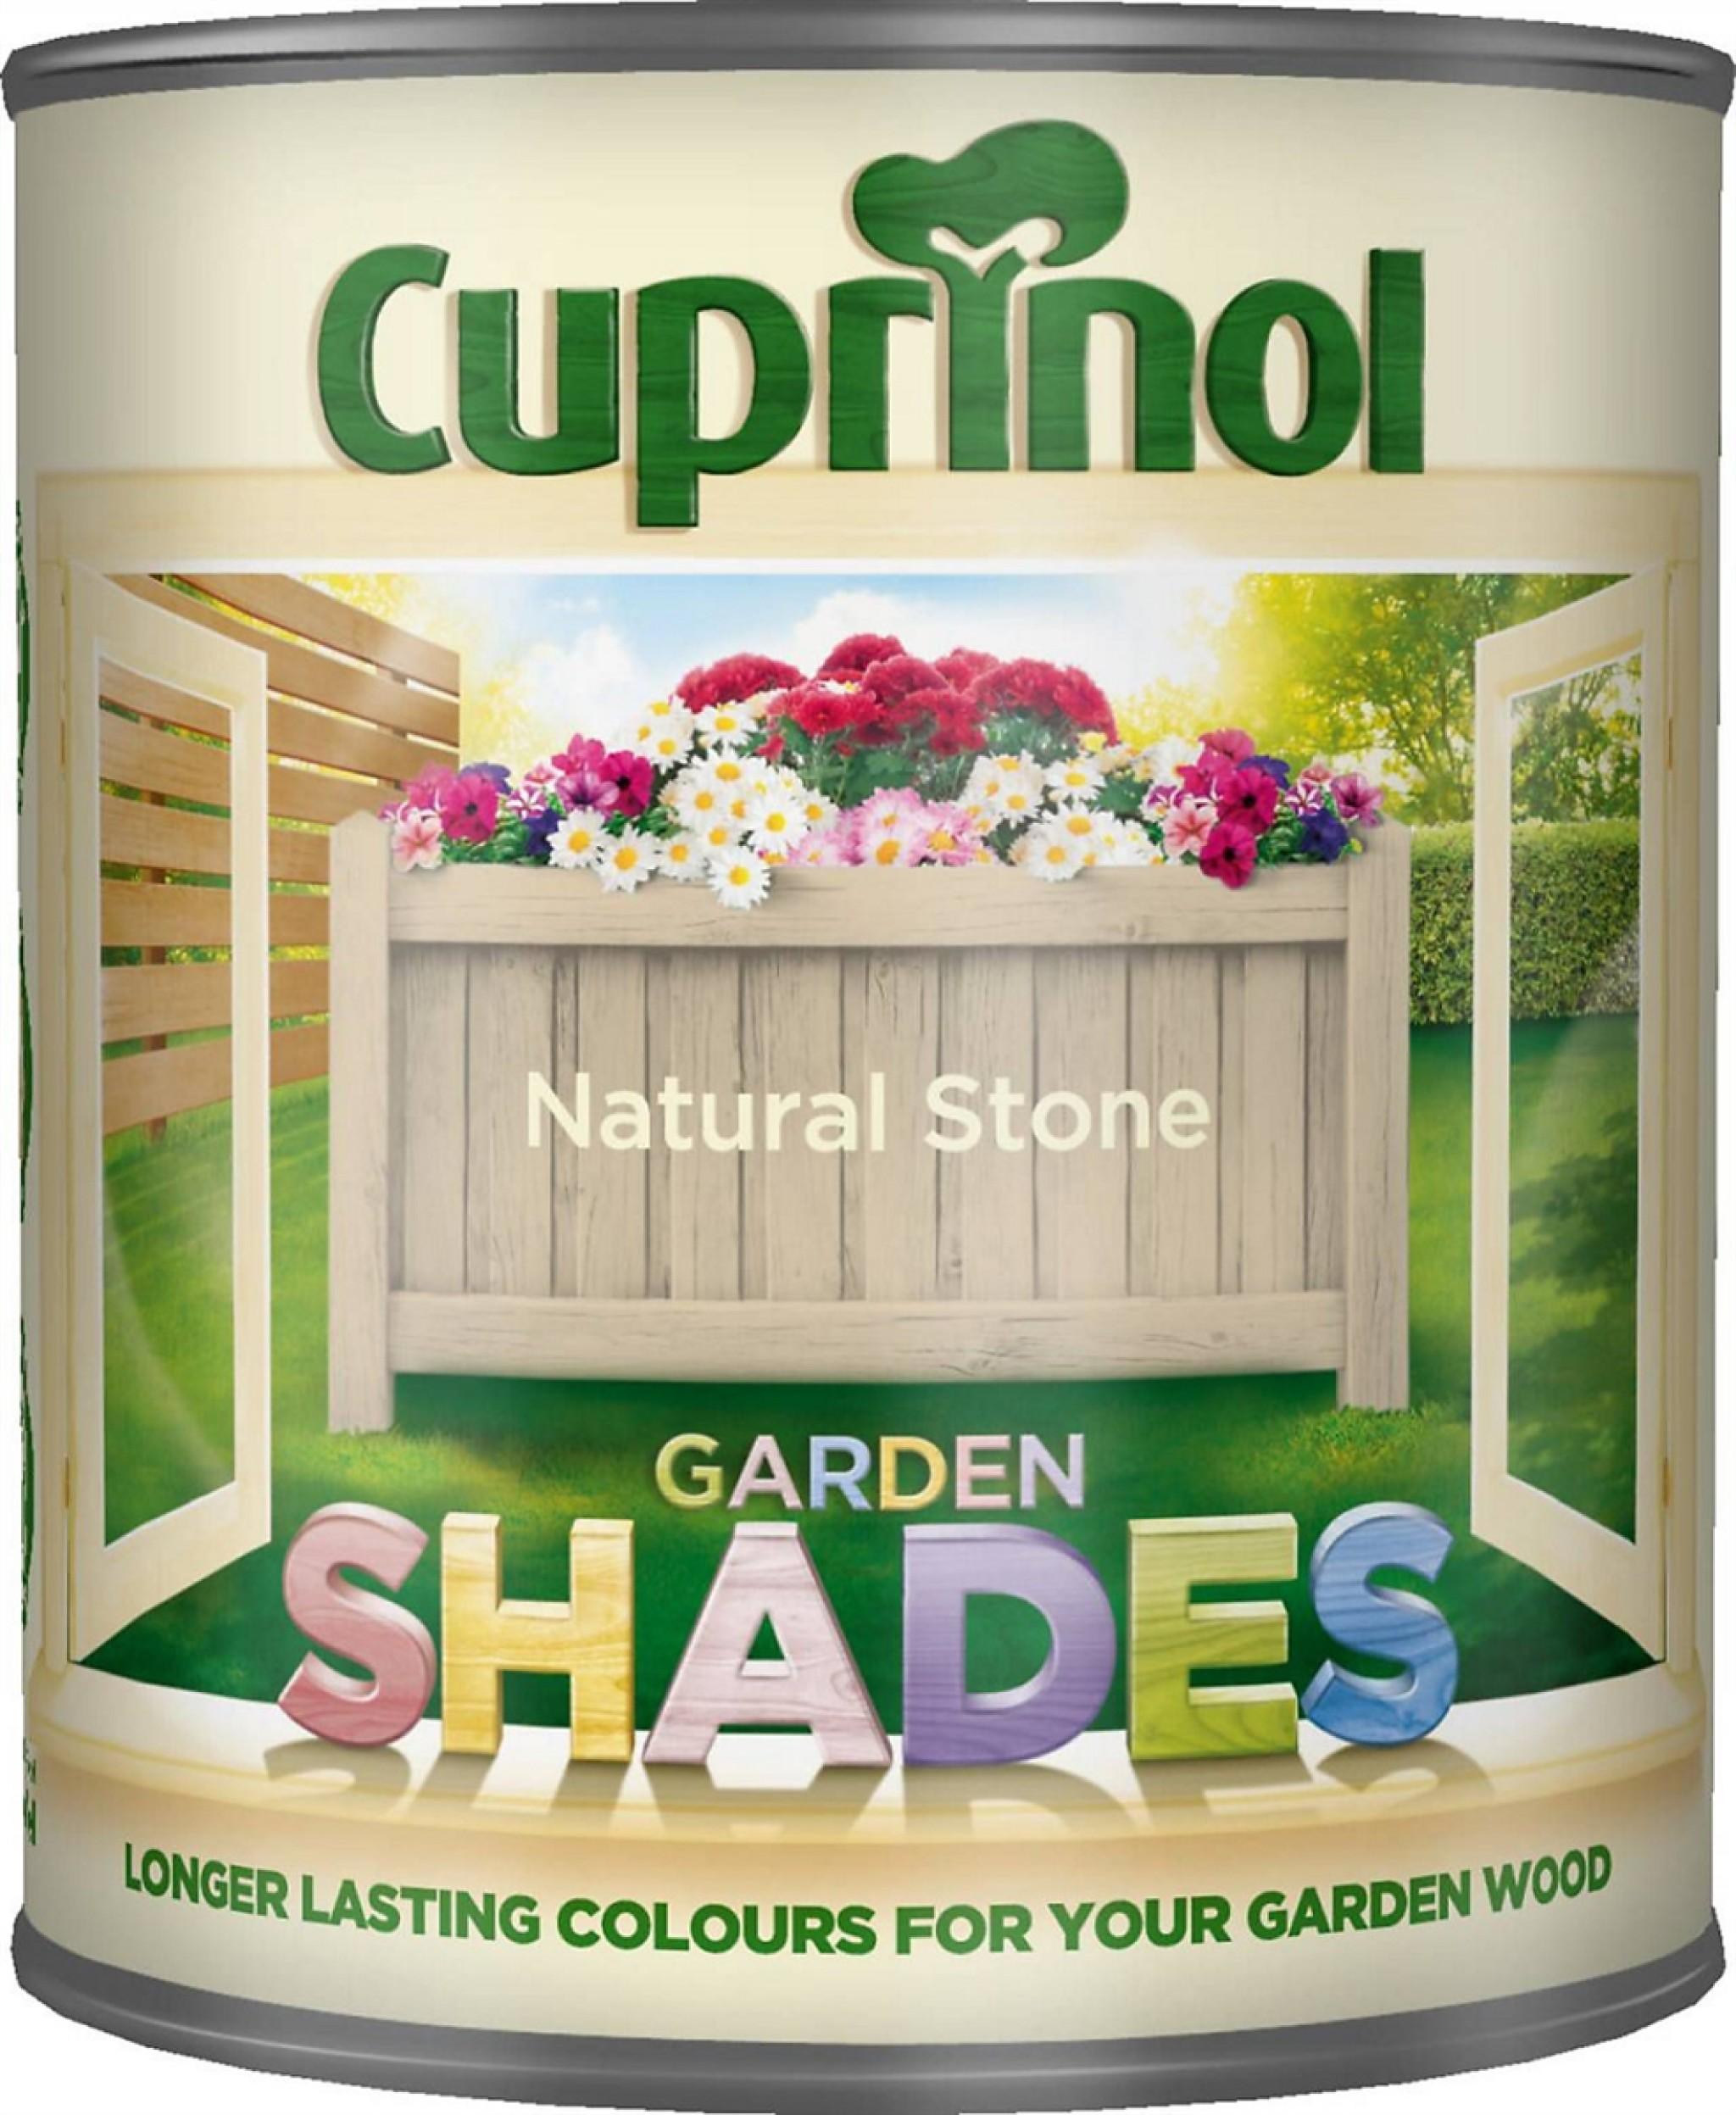 Cuprinol Garden Shades Natural Stone Matt Wood Paint 1ltr Staines And Brights